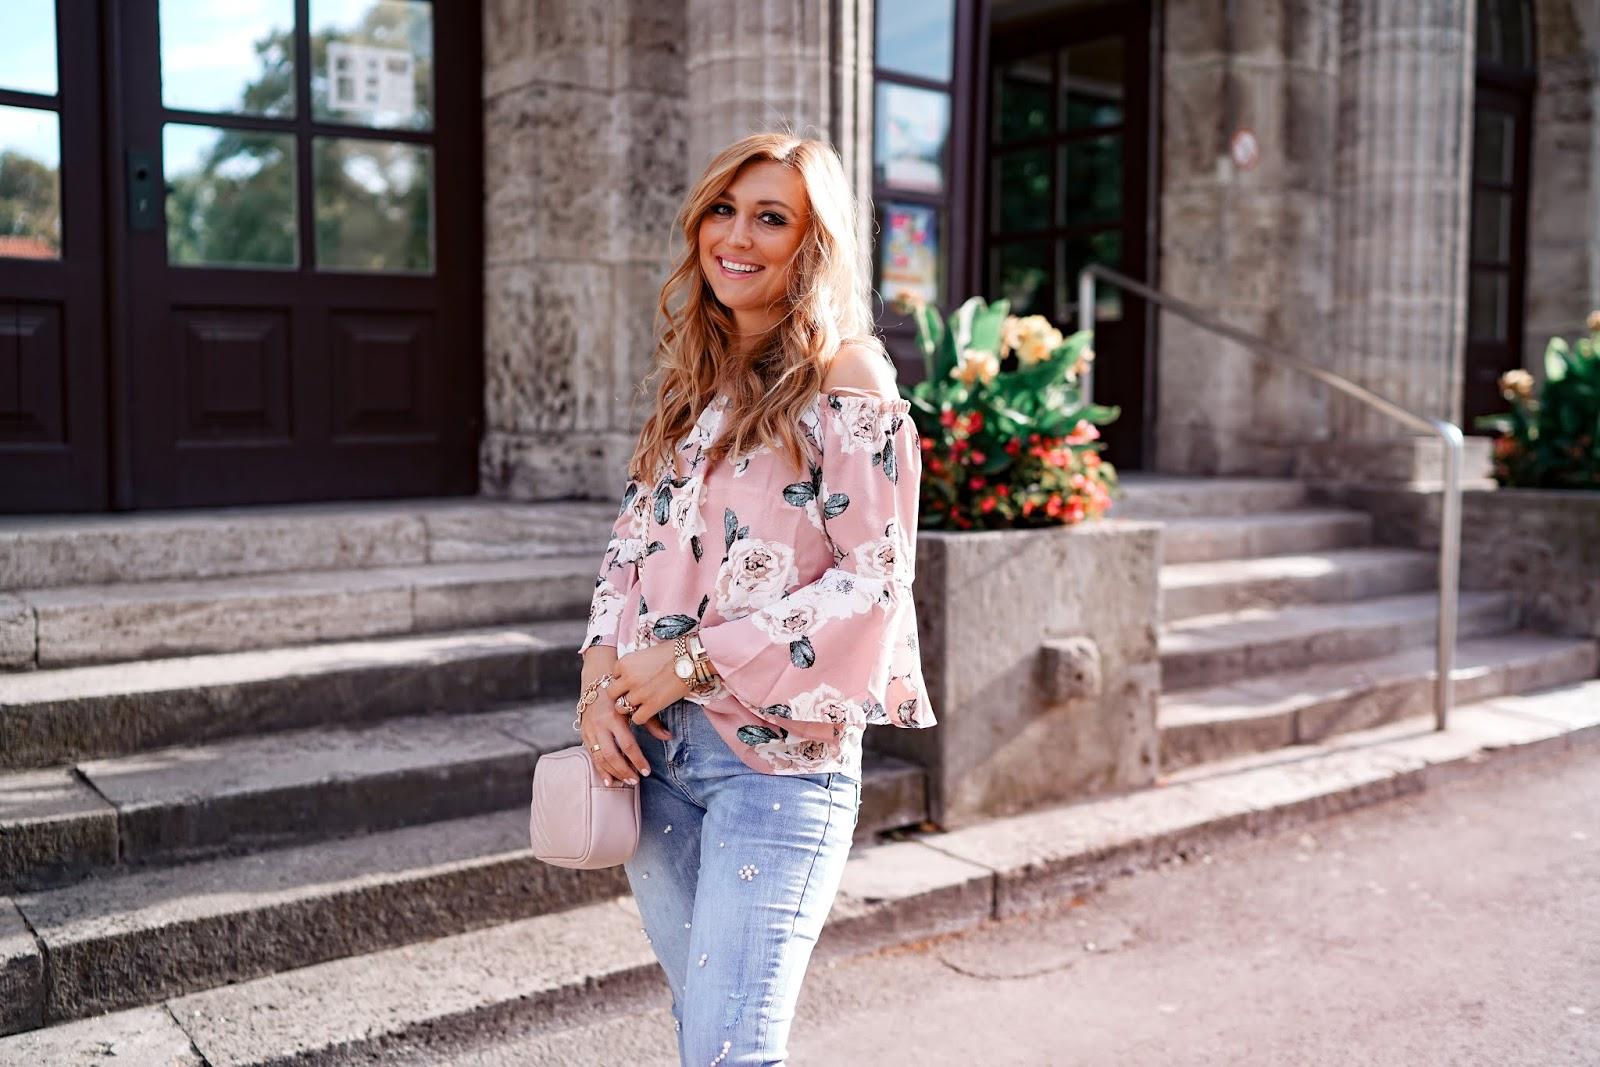 jeans-mit-perlen-perlen Jeanshose-bloggerstyle-Spätsommer-look-Spätsommeroutfit-jeanshose-helle-jeans-hose-Fashionblogger-fashionstylebyjohanna.